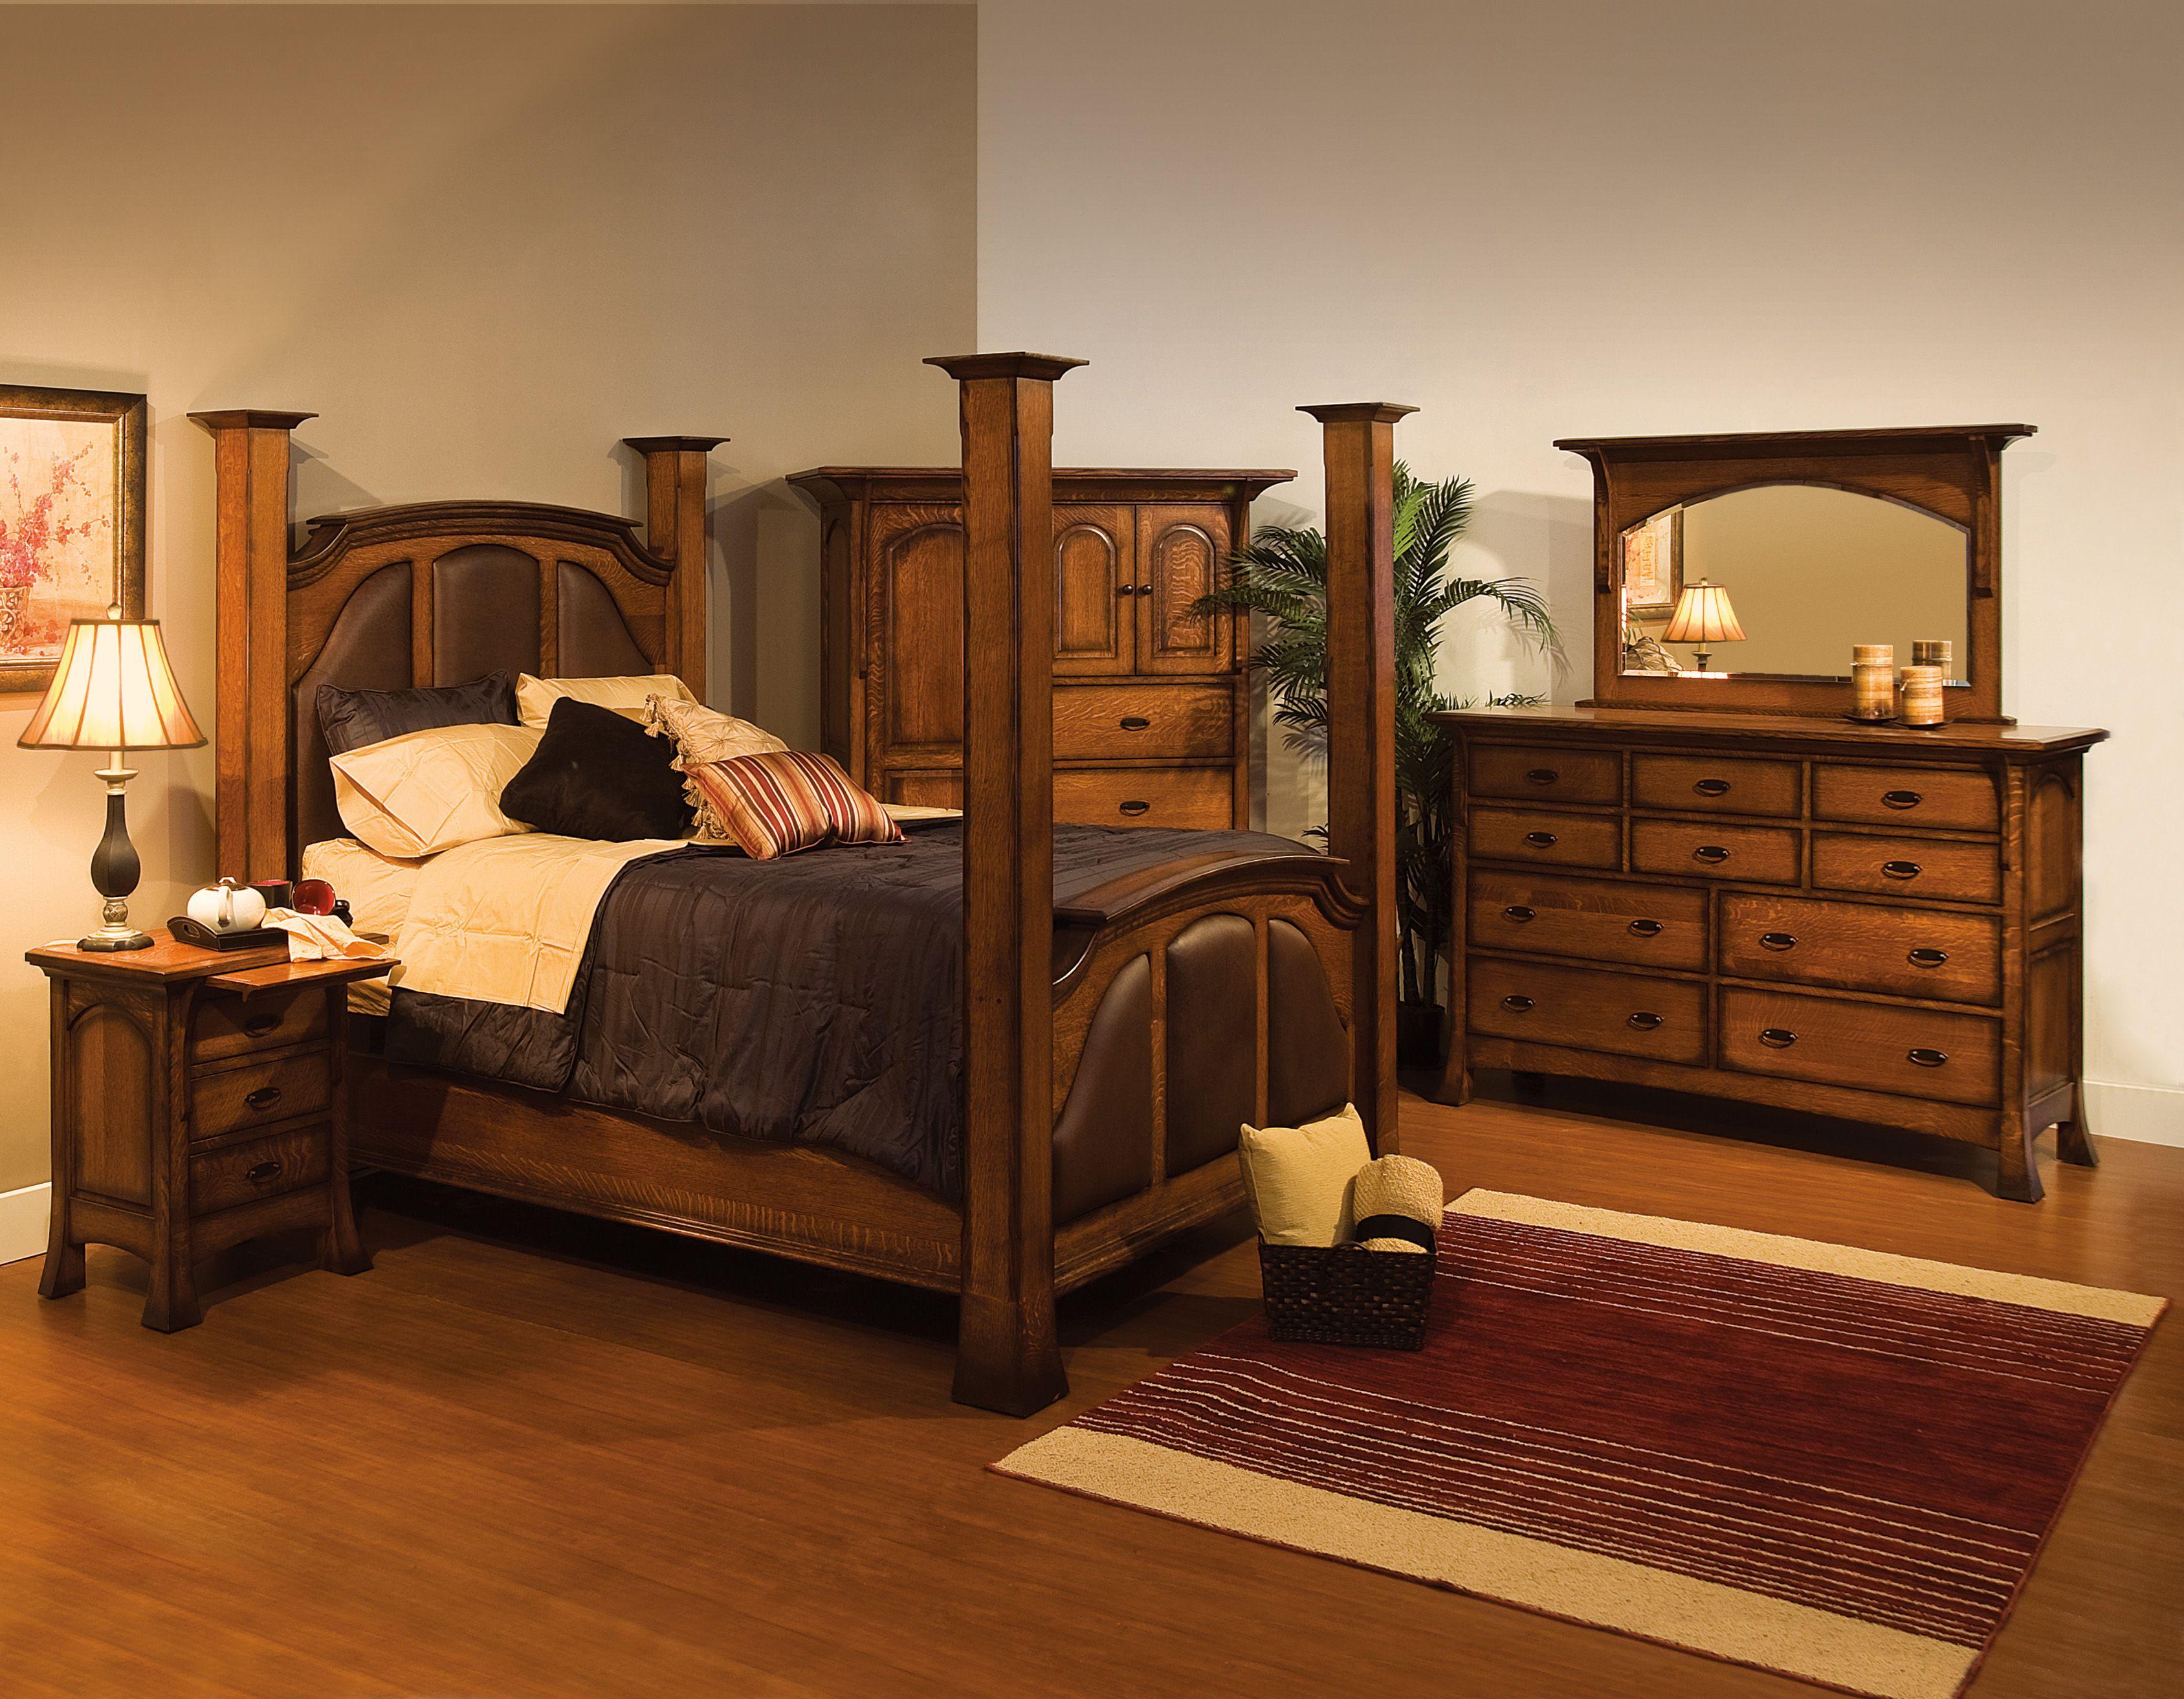 Amish Heirlooms Furniture